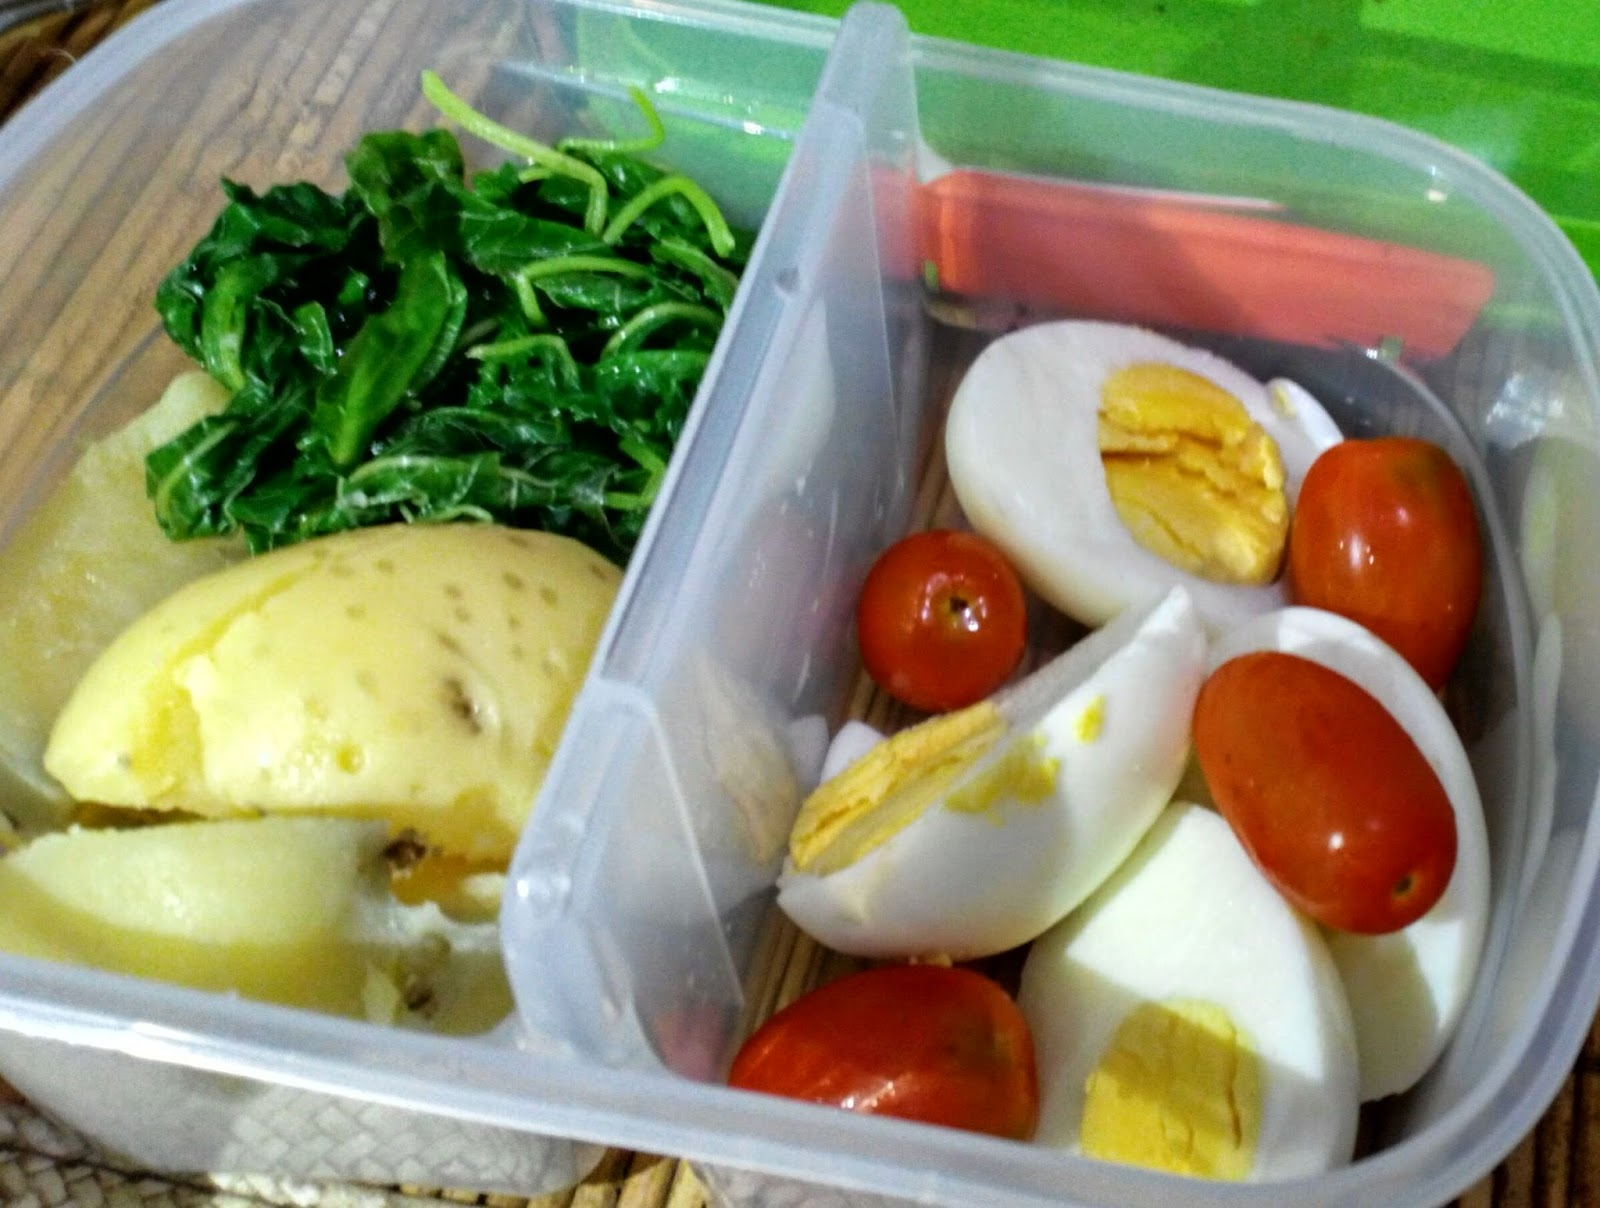 10 Makanan yang Membuat Diet Mudah Dijalani